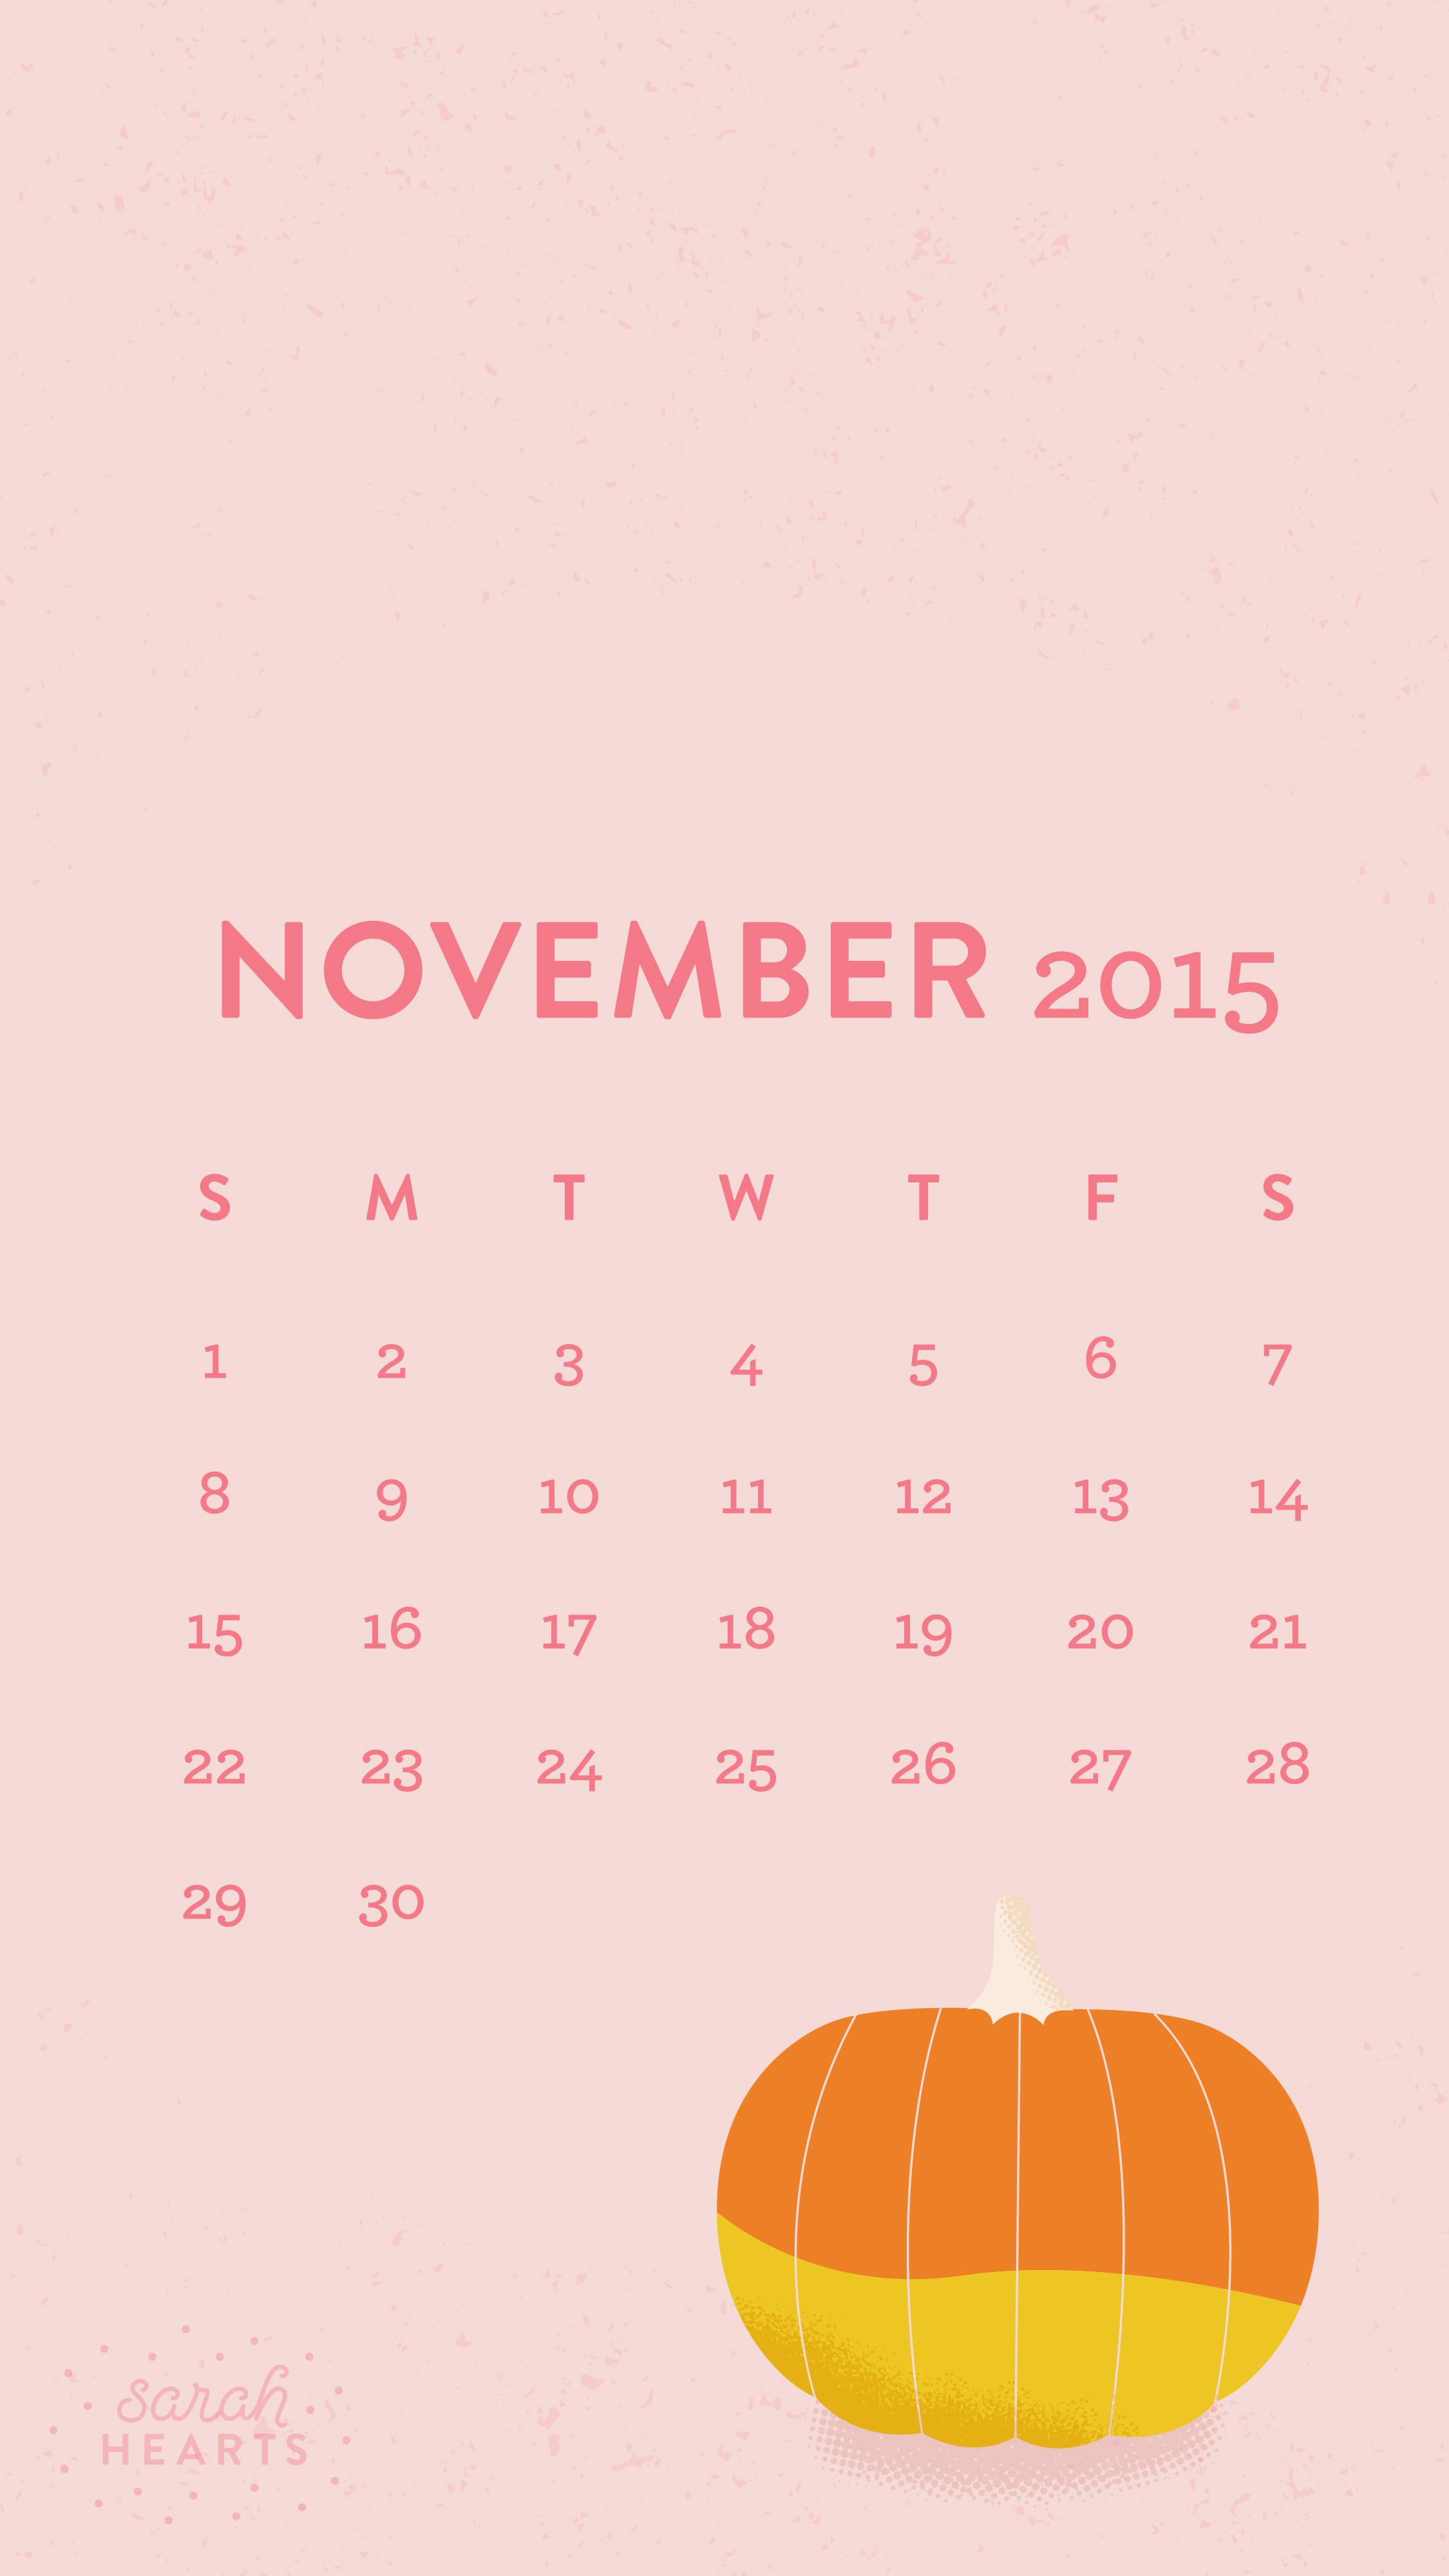 Fall Leaves Ipad Wallpaper November 2015 Calendar Wallpaper Sarah Hearts